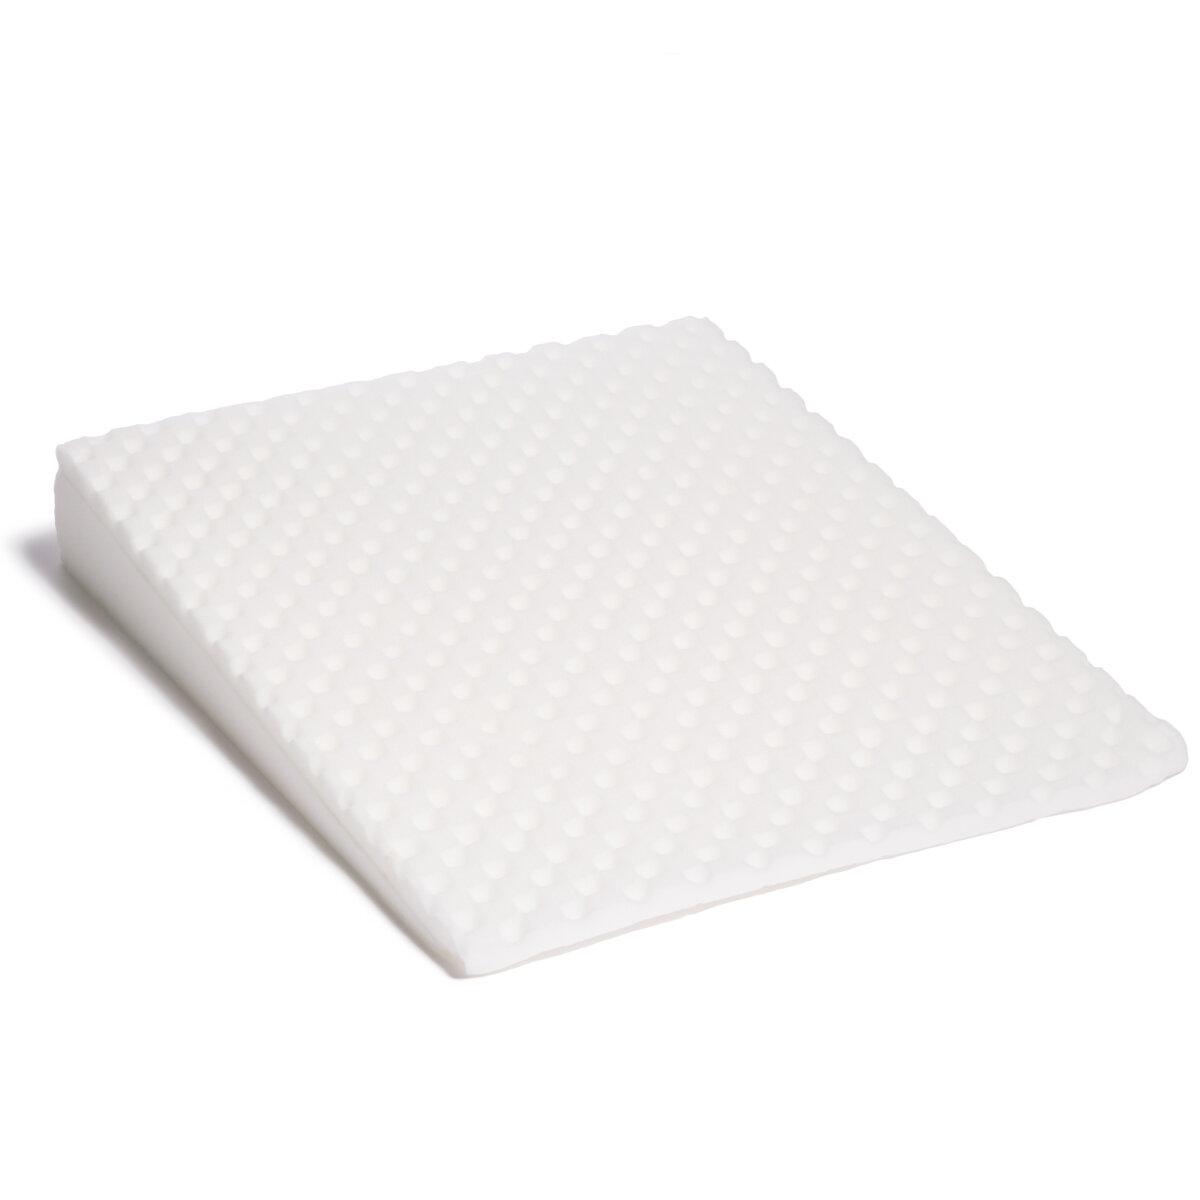 Hermell Softeze Foam Wedge Ebay